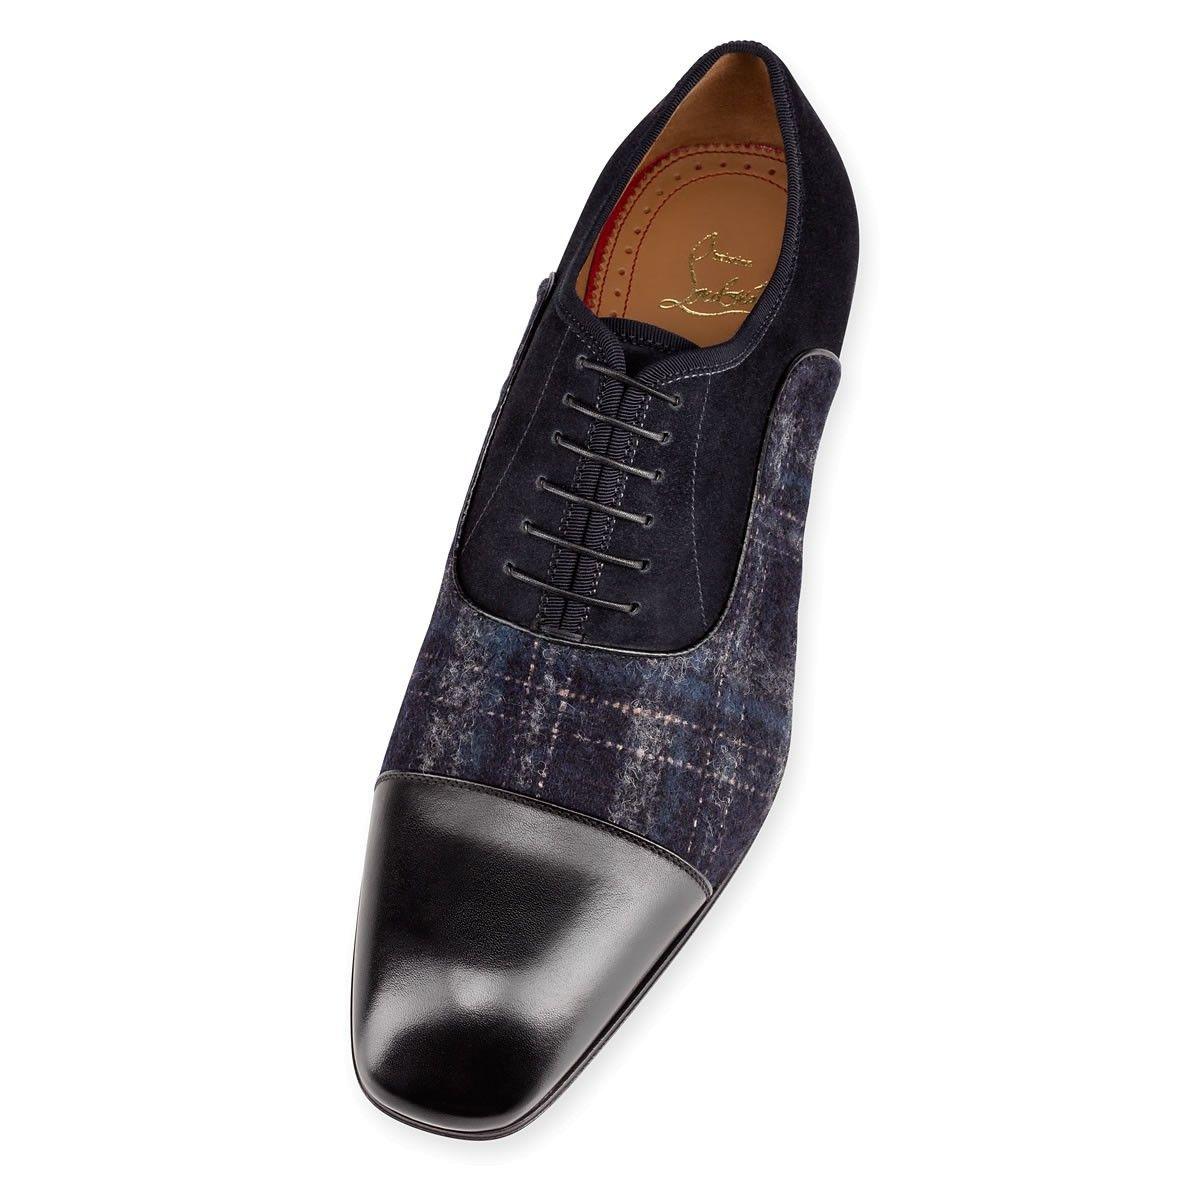 4dd85b42bc6 Greggo Flat Black Navy Cotton - Men Shoes - Christian Louboutin